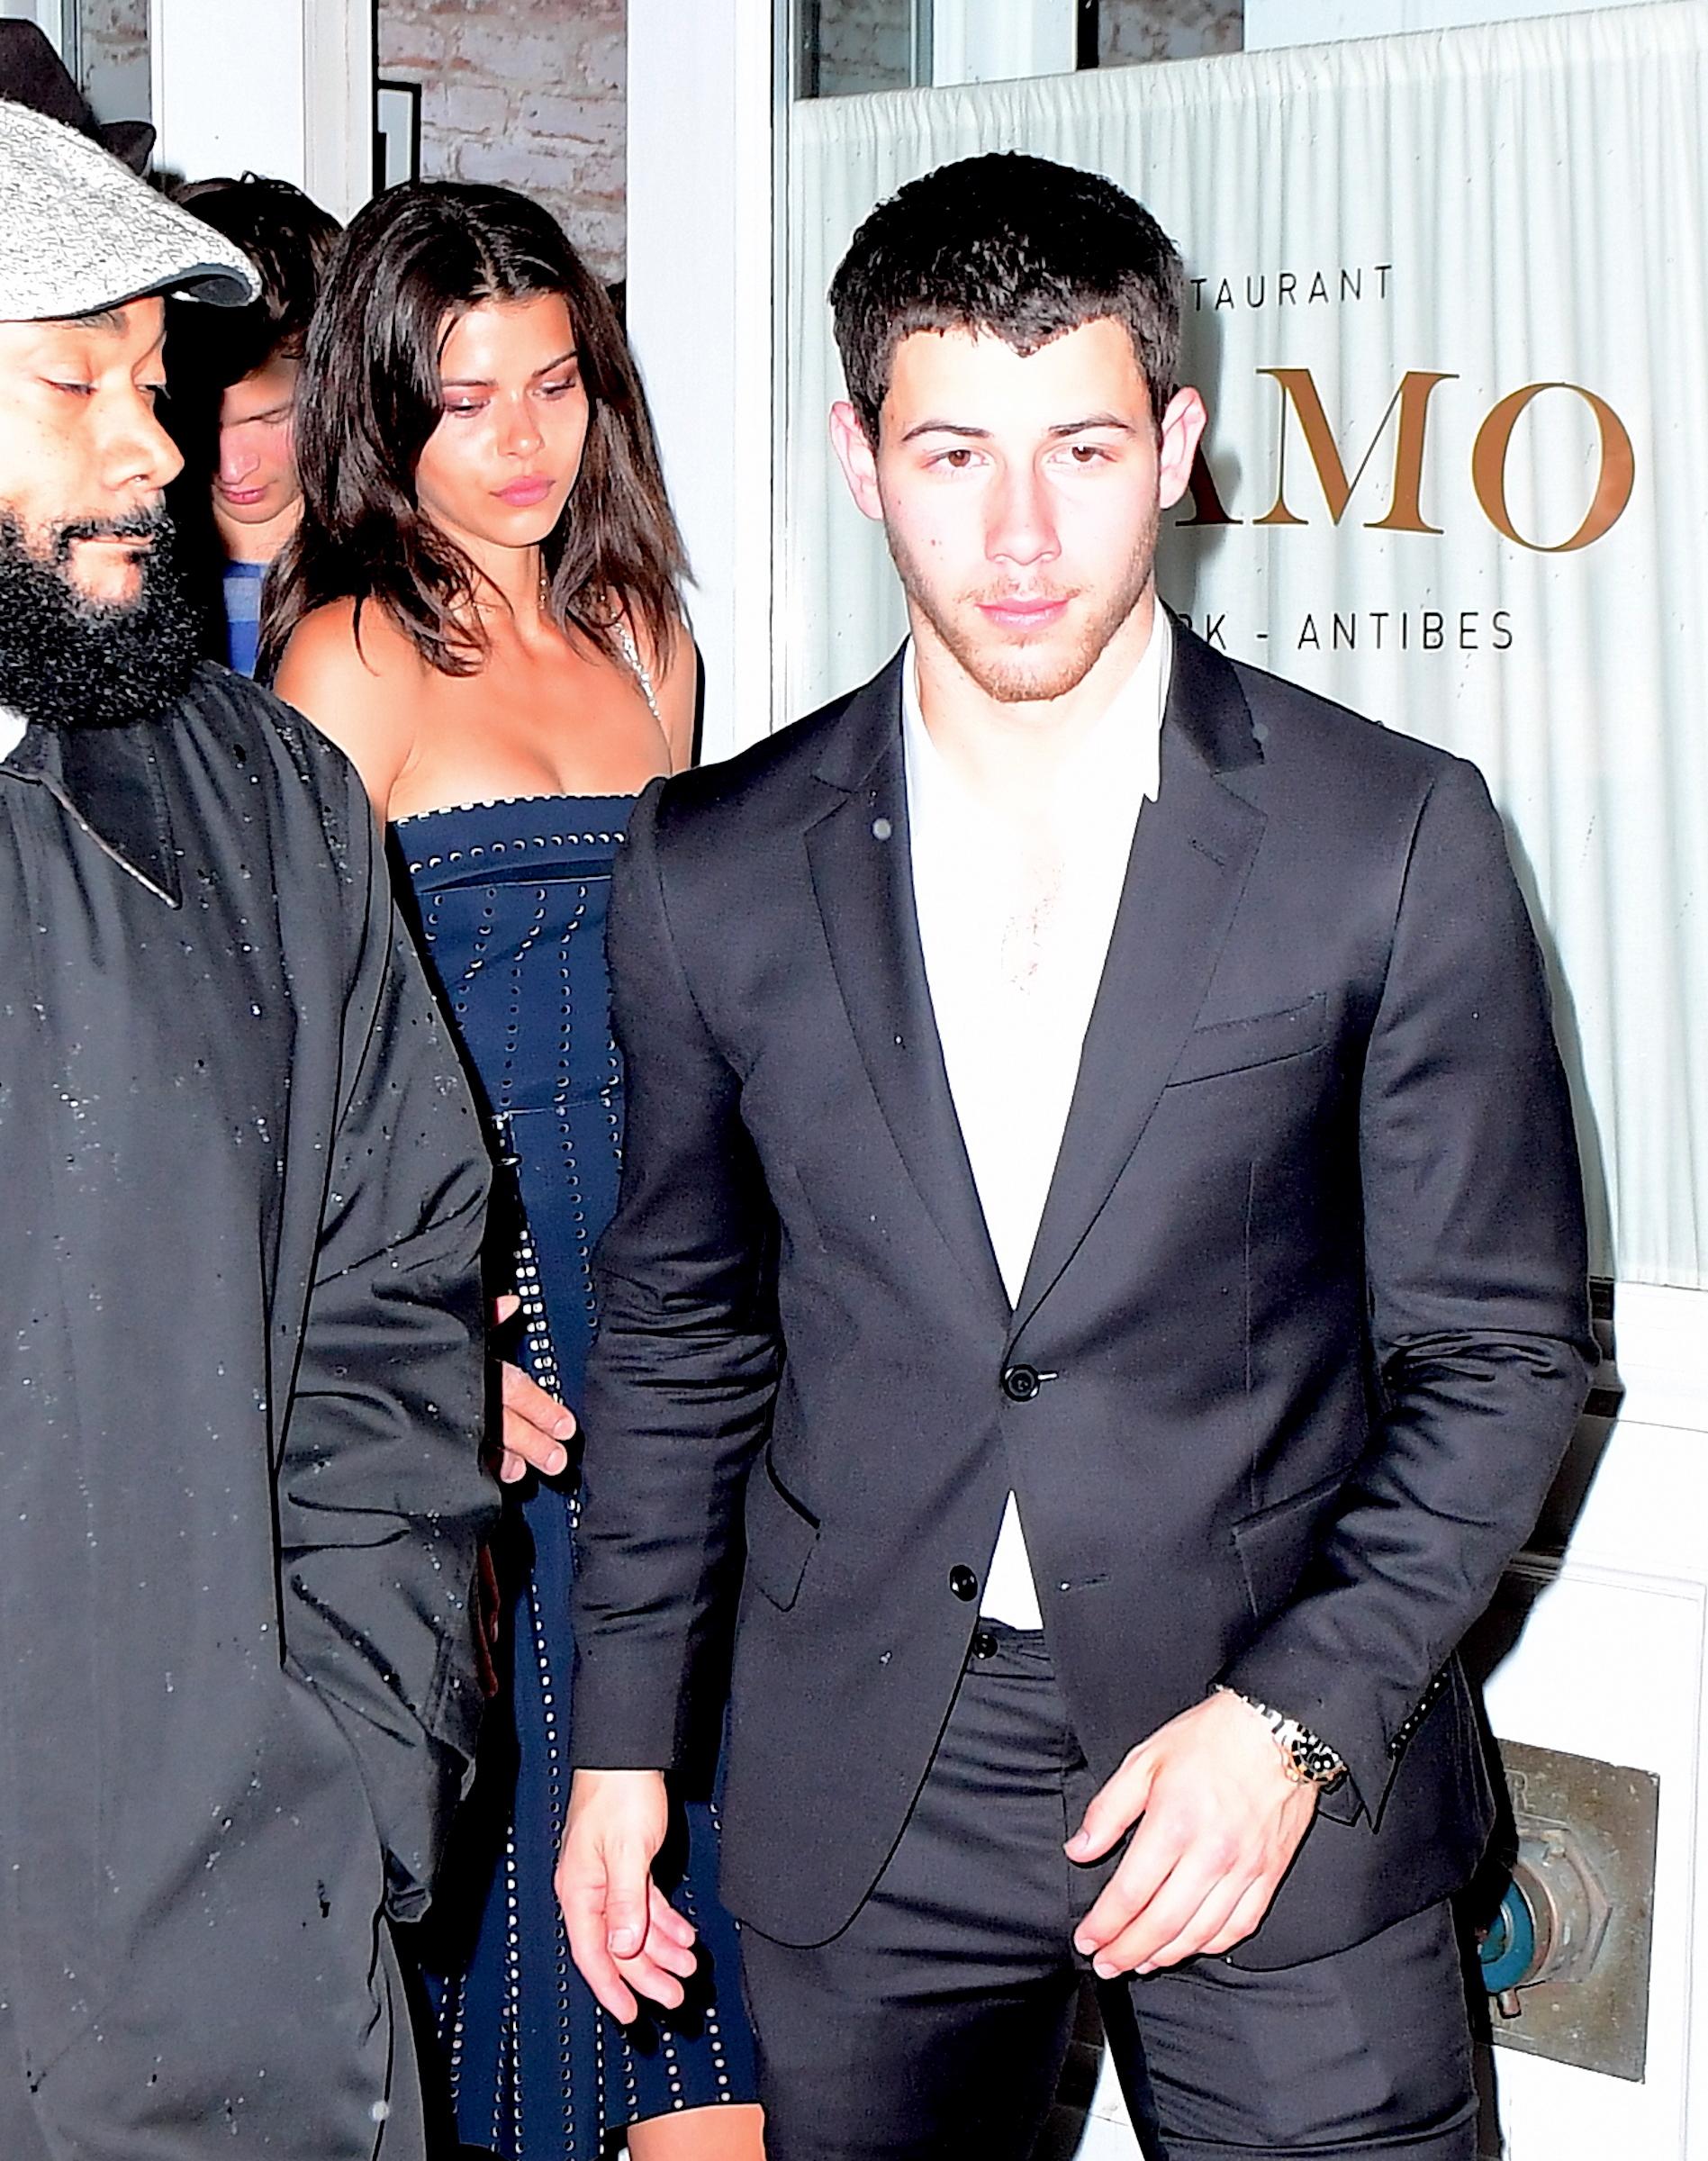 Nick Jonas and Georgia Fowler - New celebrity couples of